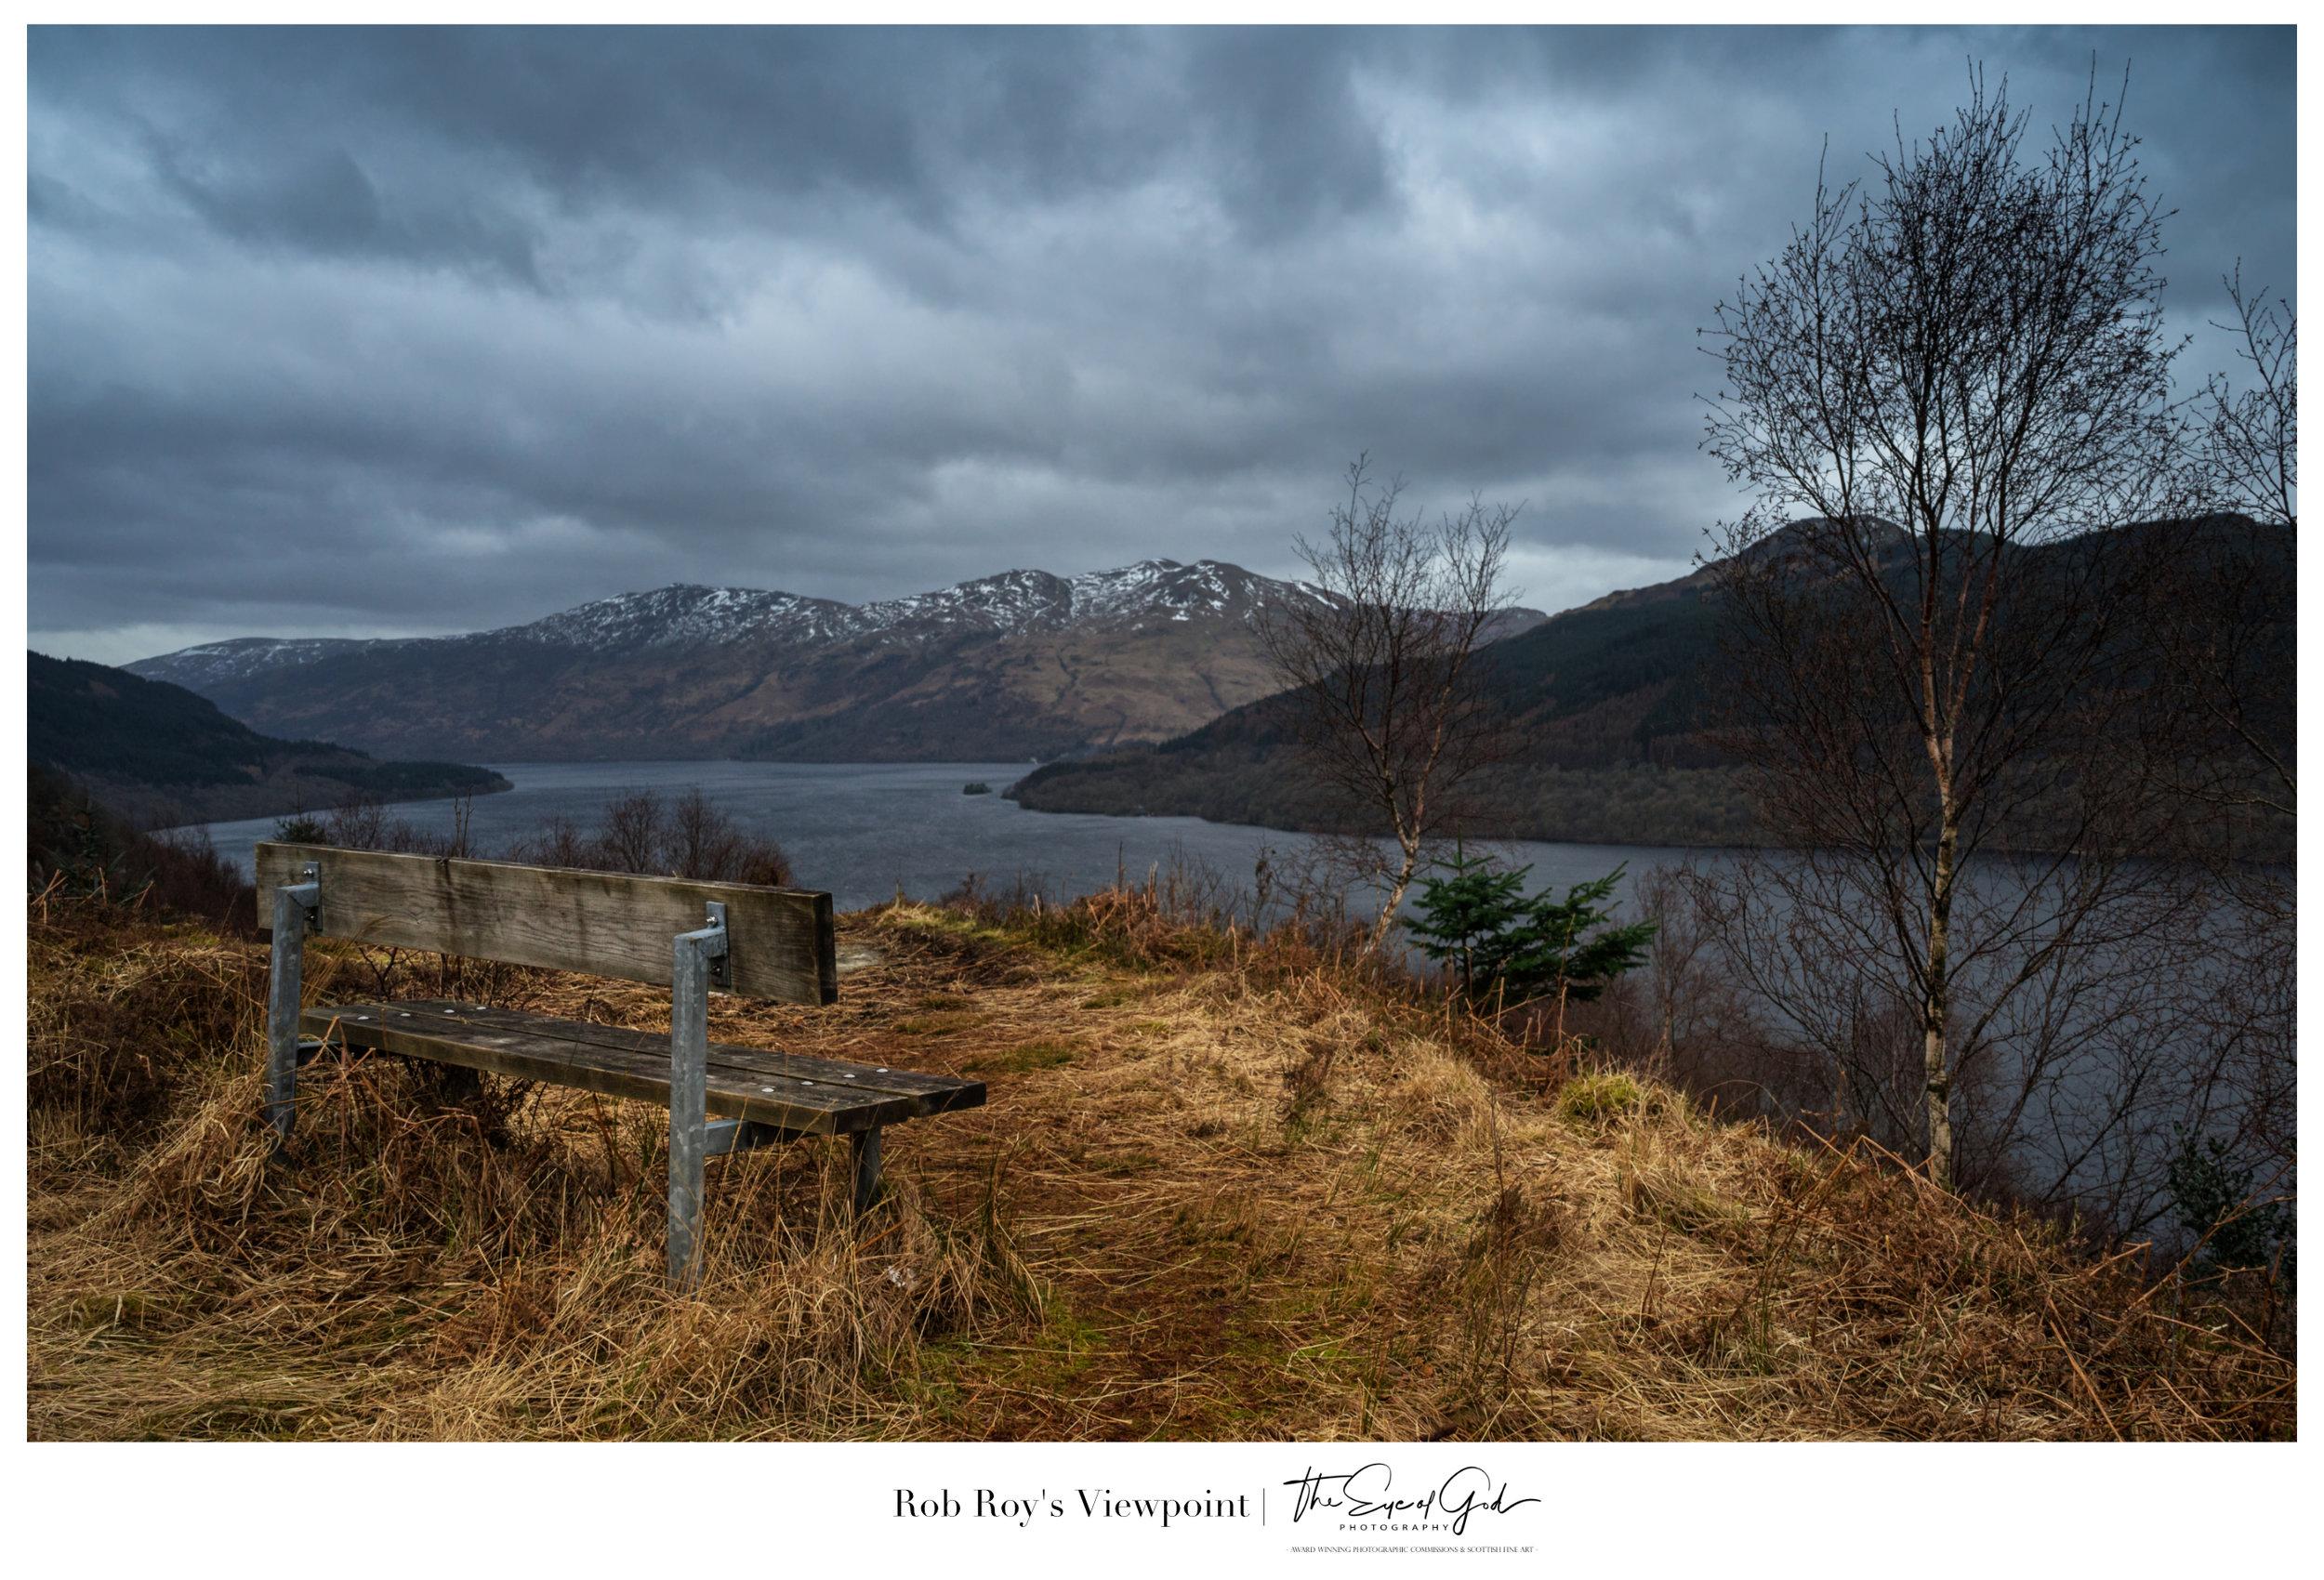 Rob_Roy's_Viewpoint_Inversnaid_Loch_Lomond_Scott_Wanstall